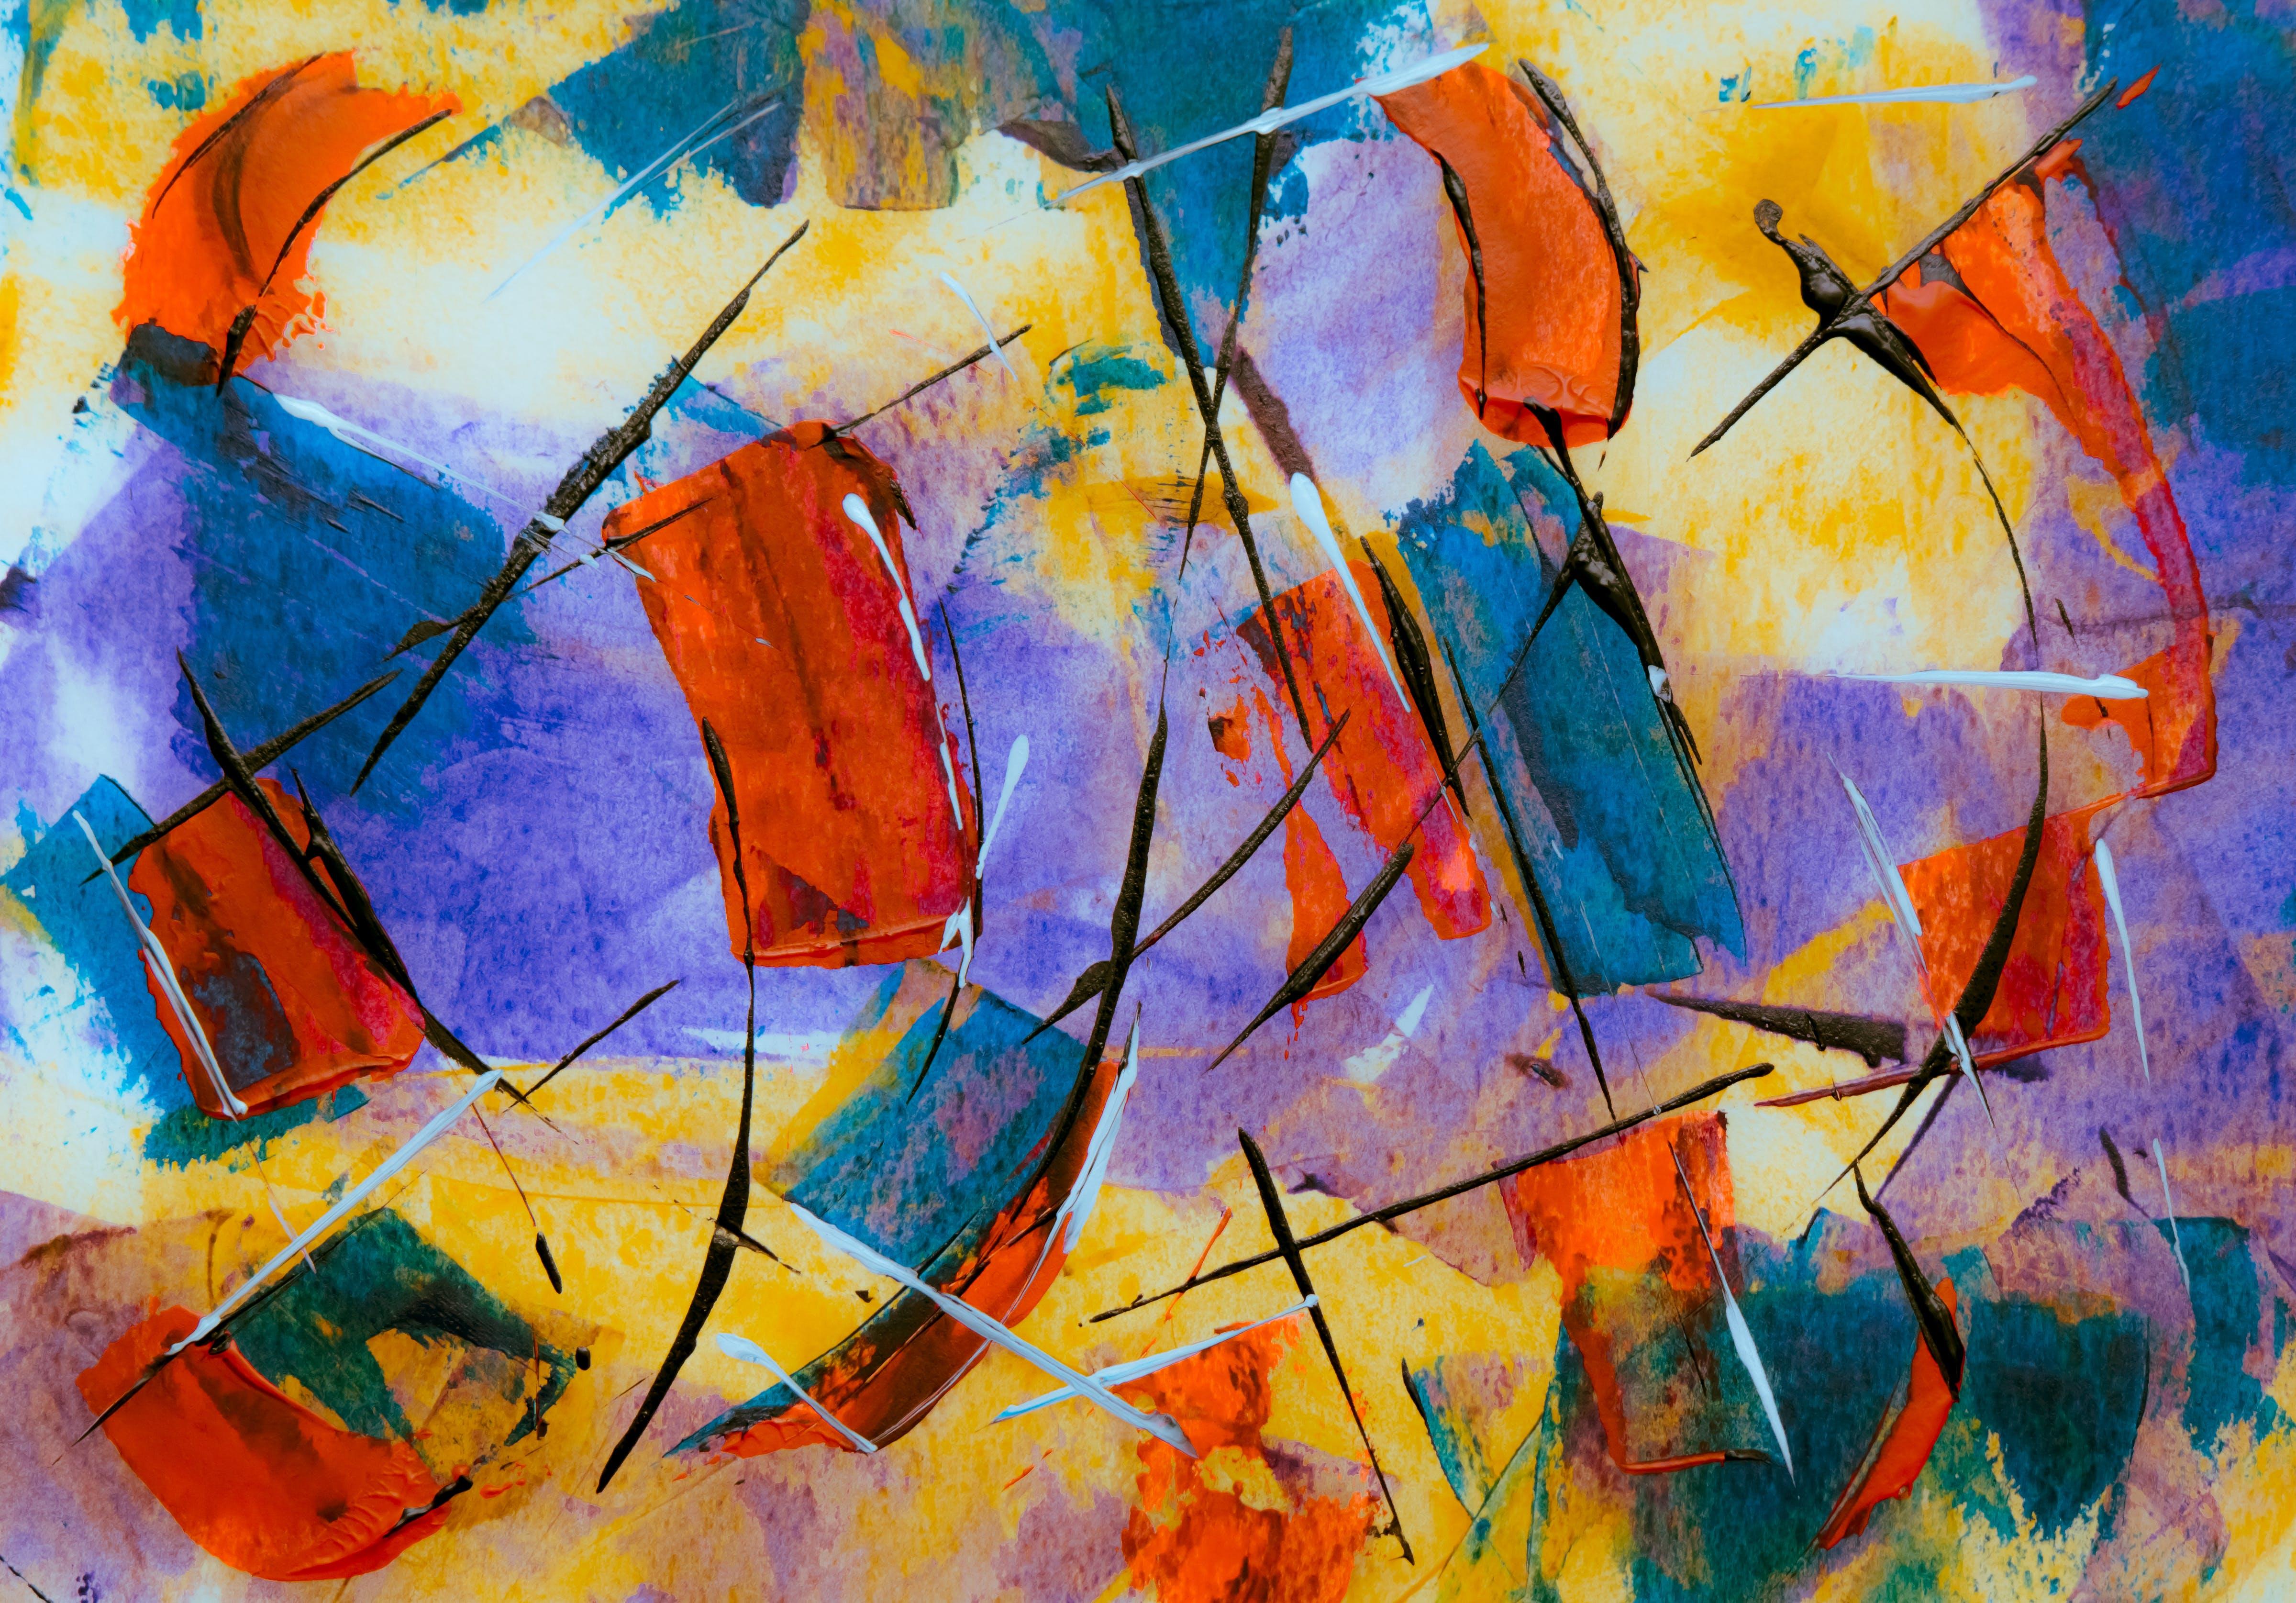 Kostenloses Stock Foto zu abstrakt, abstraktes gemälde, acrylfarbe, expressionismus